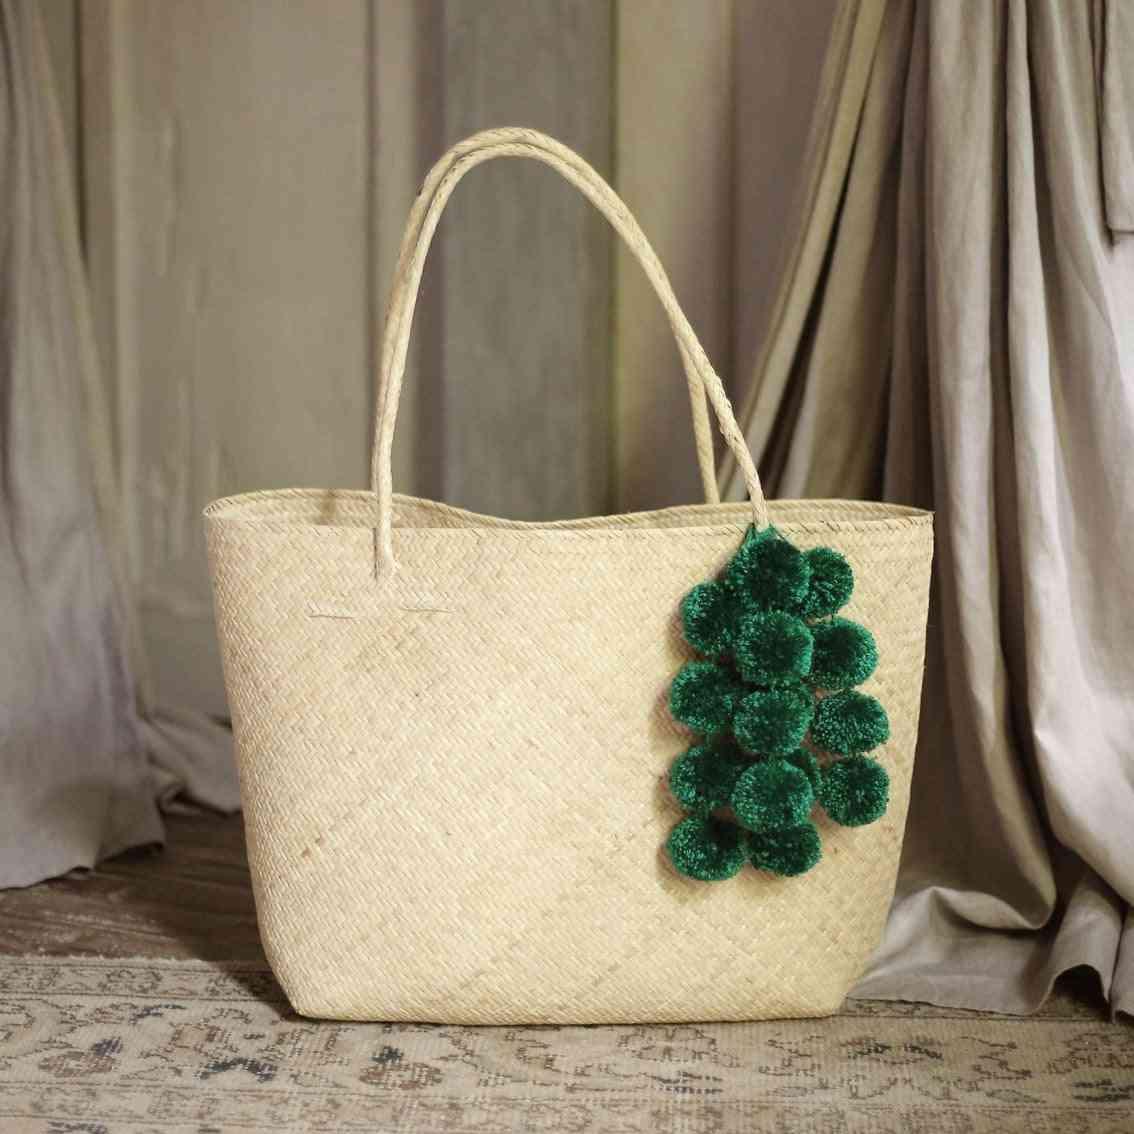 Borneo Sani Straw Tote Bag - With Emerald Pom-poms